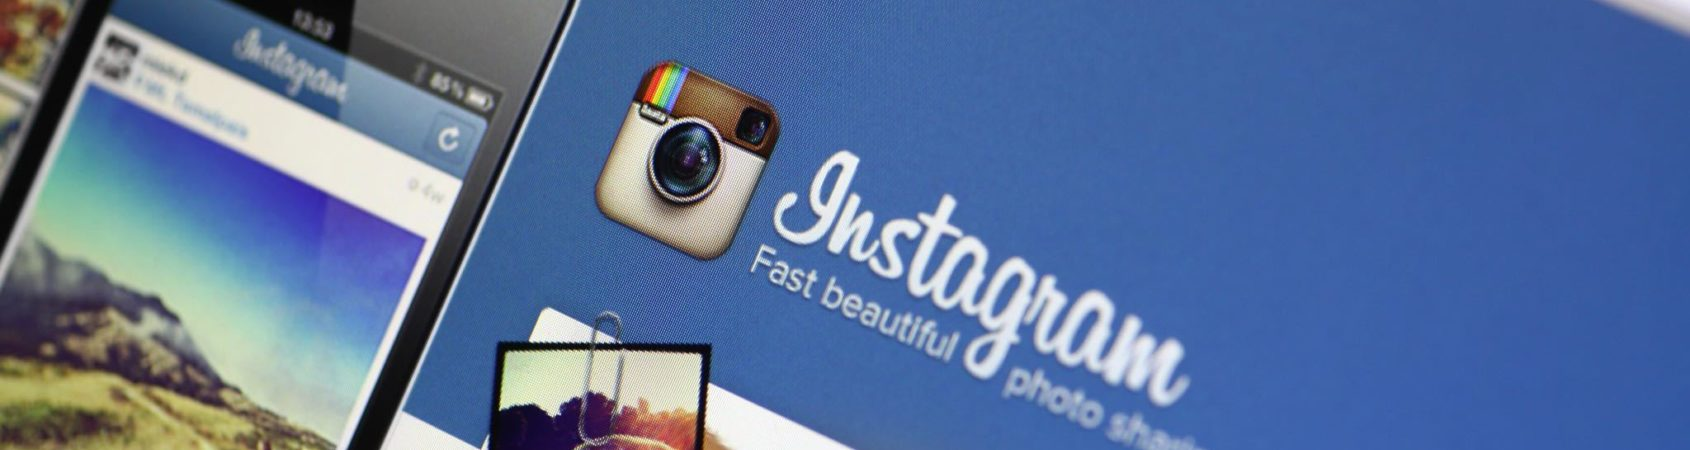 Utiliser efficacement Instagram dans sa stratégie marketing